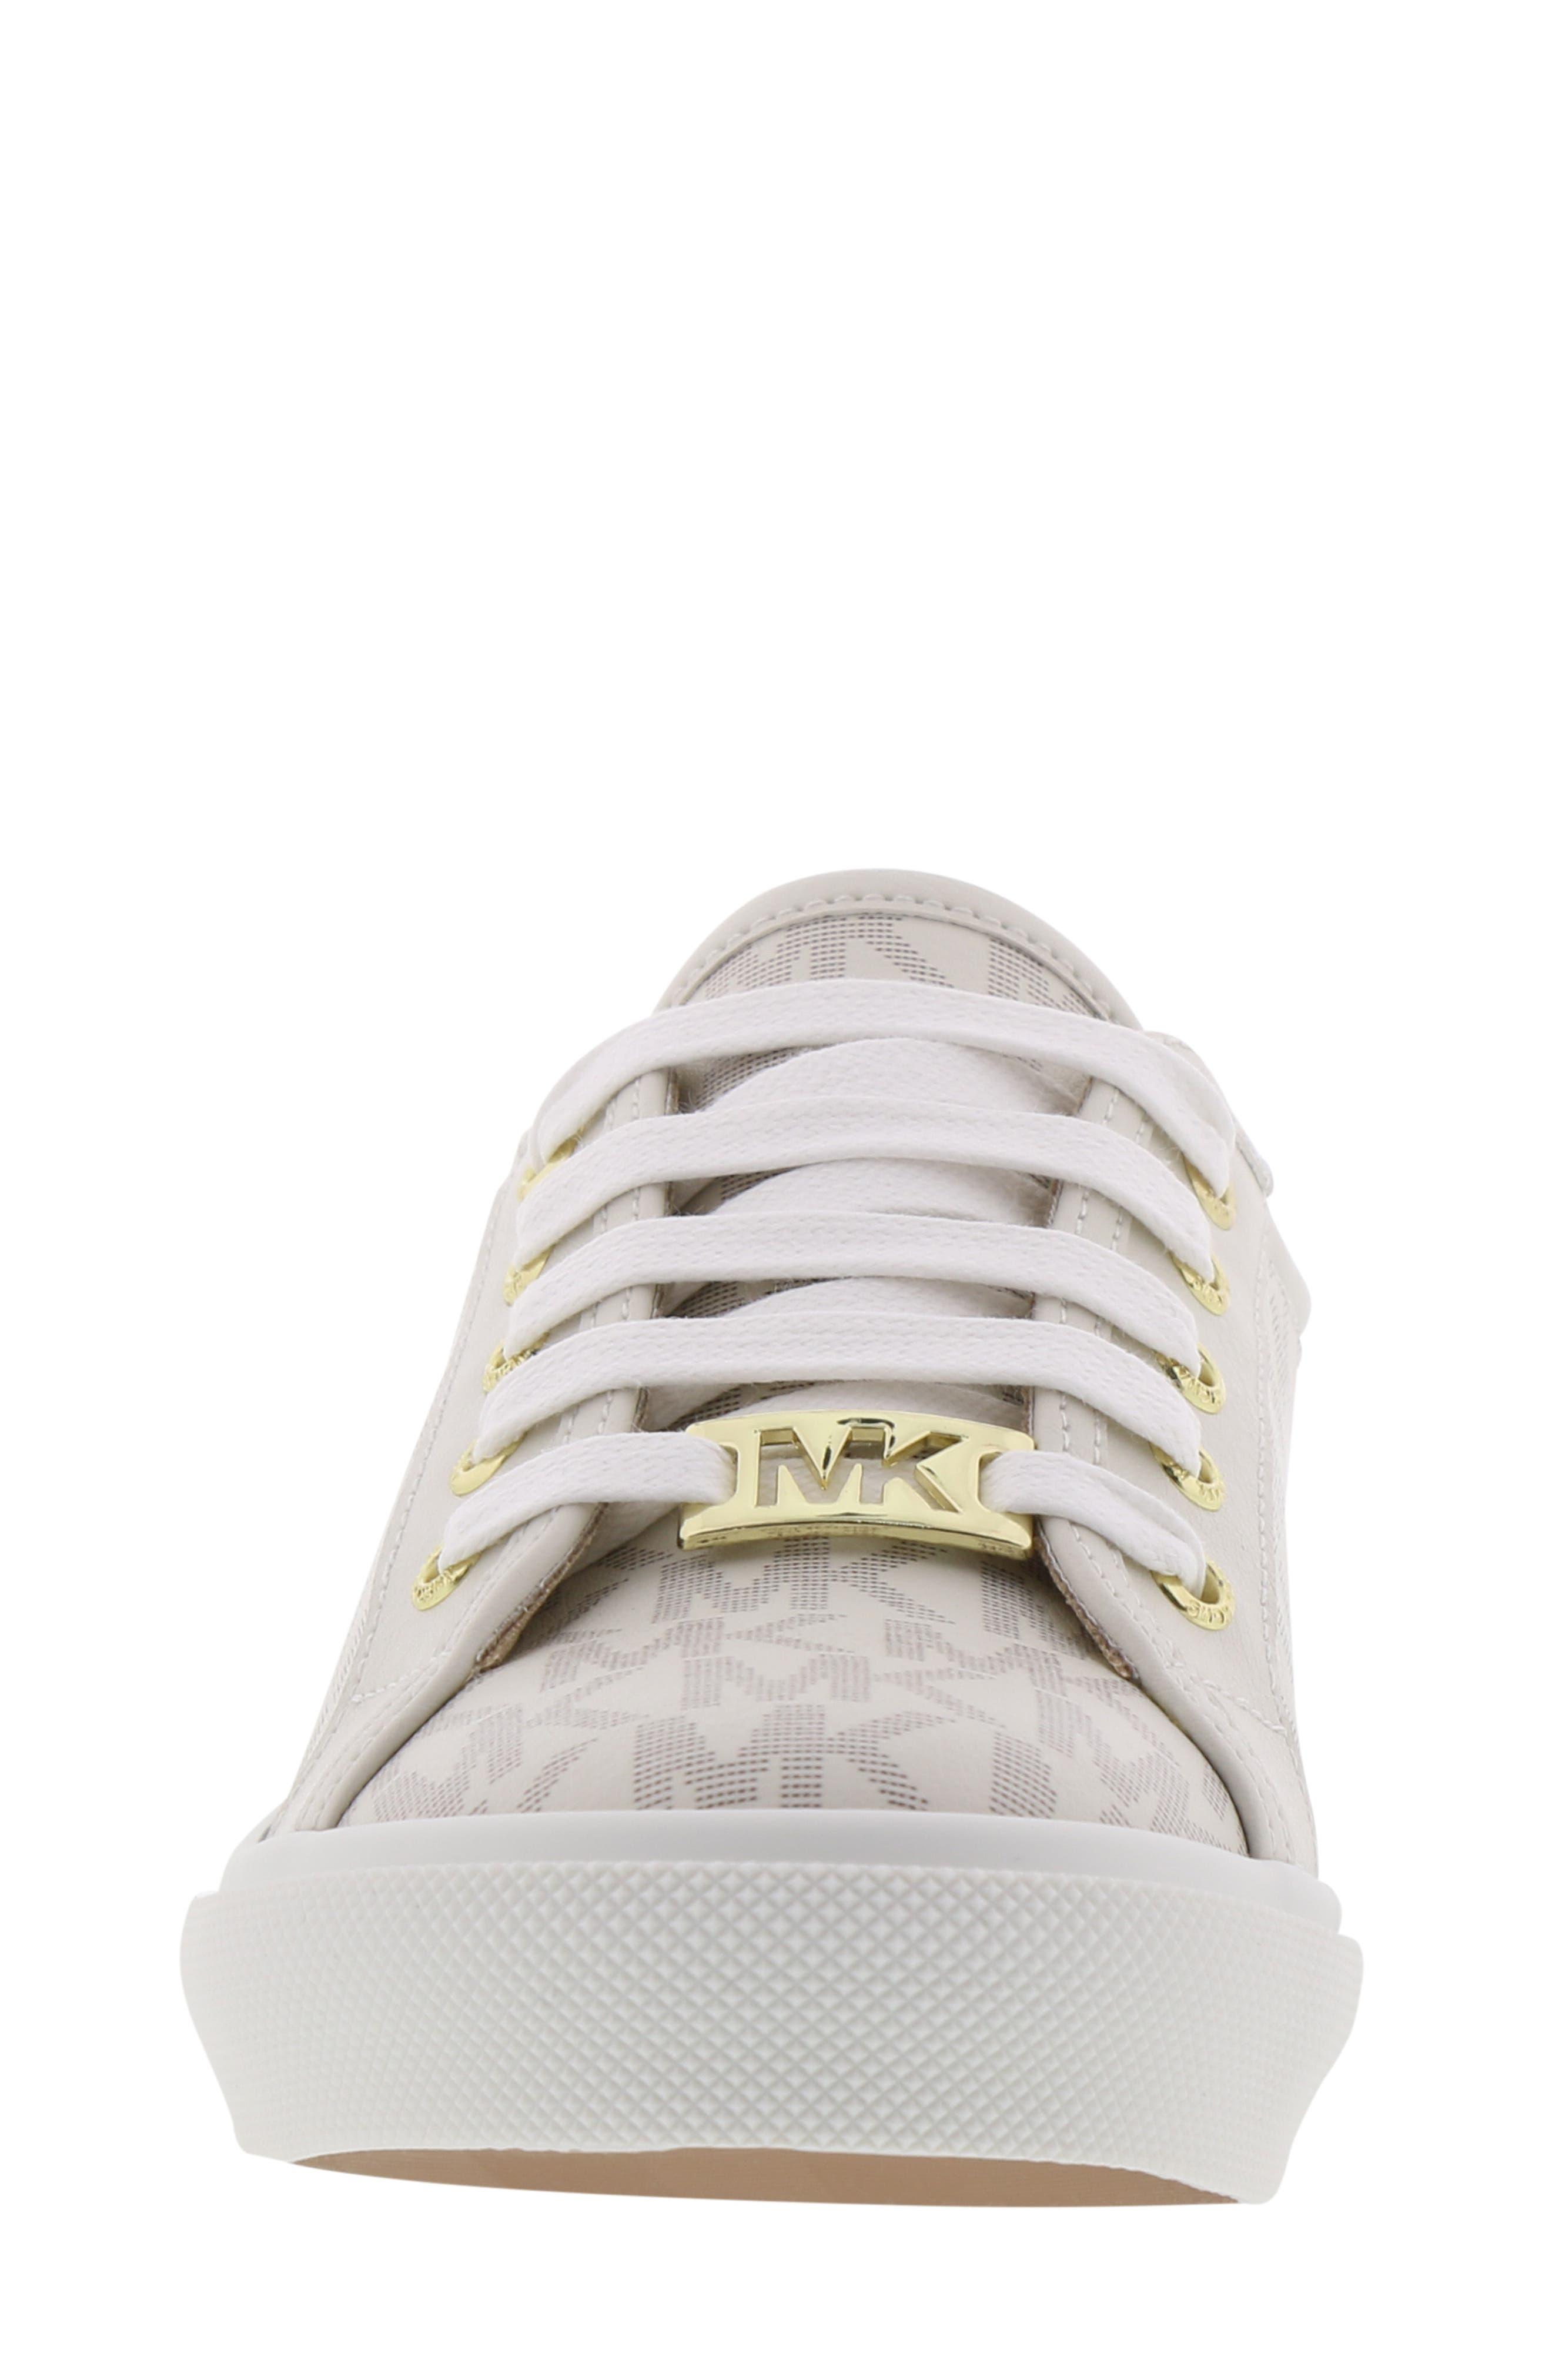 MICHAEL MICHAEL KORS,                             Ima Rebel Sneaker,                             Alternate thumbnail 4, color,                             VANILLA